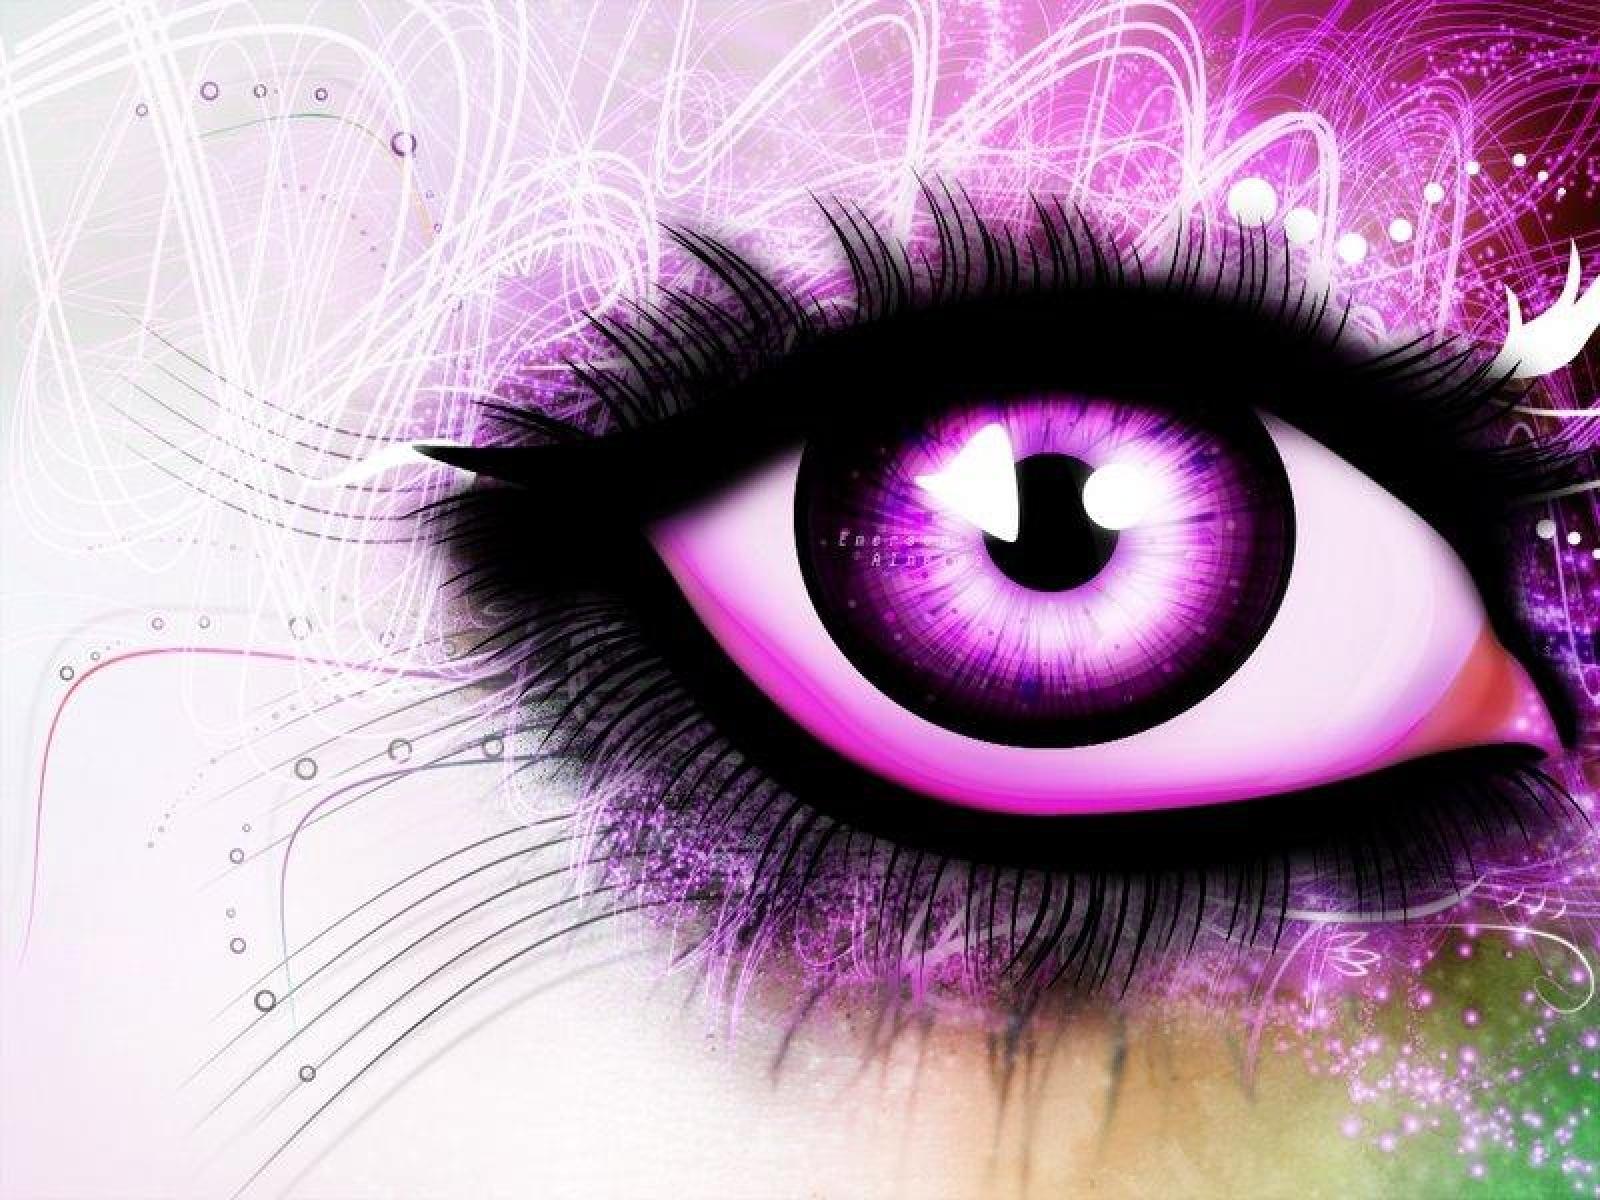 Description Purple Eyes Wallpaper is a hi res Wallpaper for pc 1600x1200